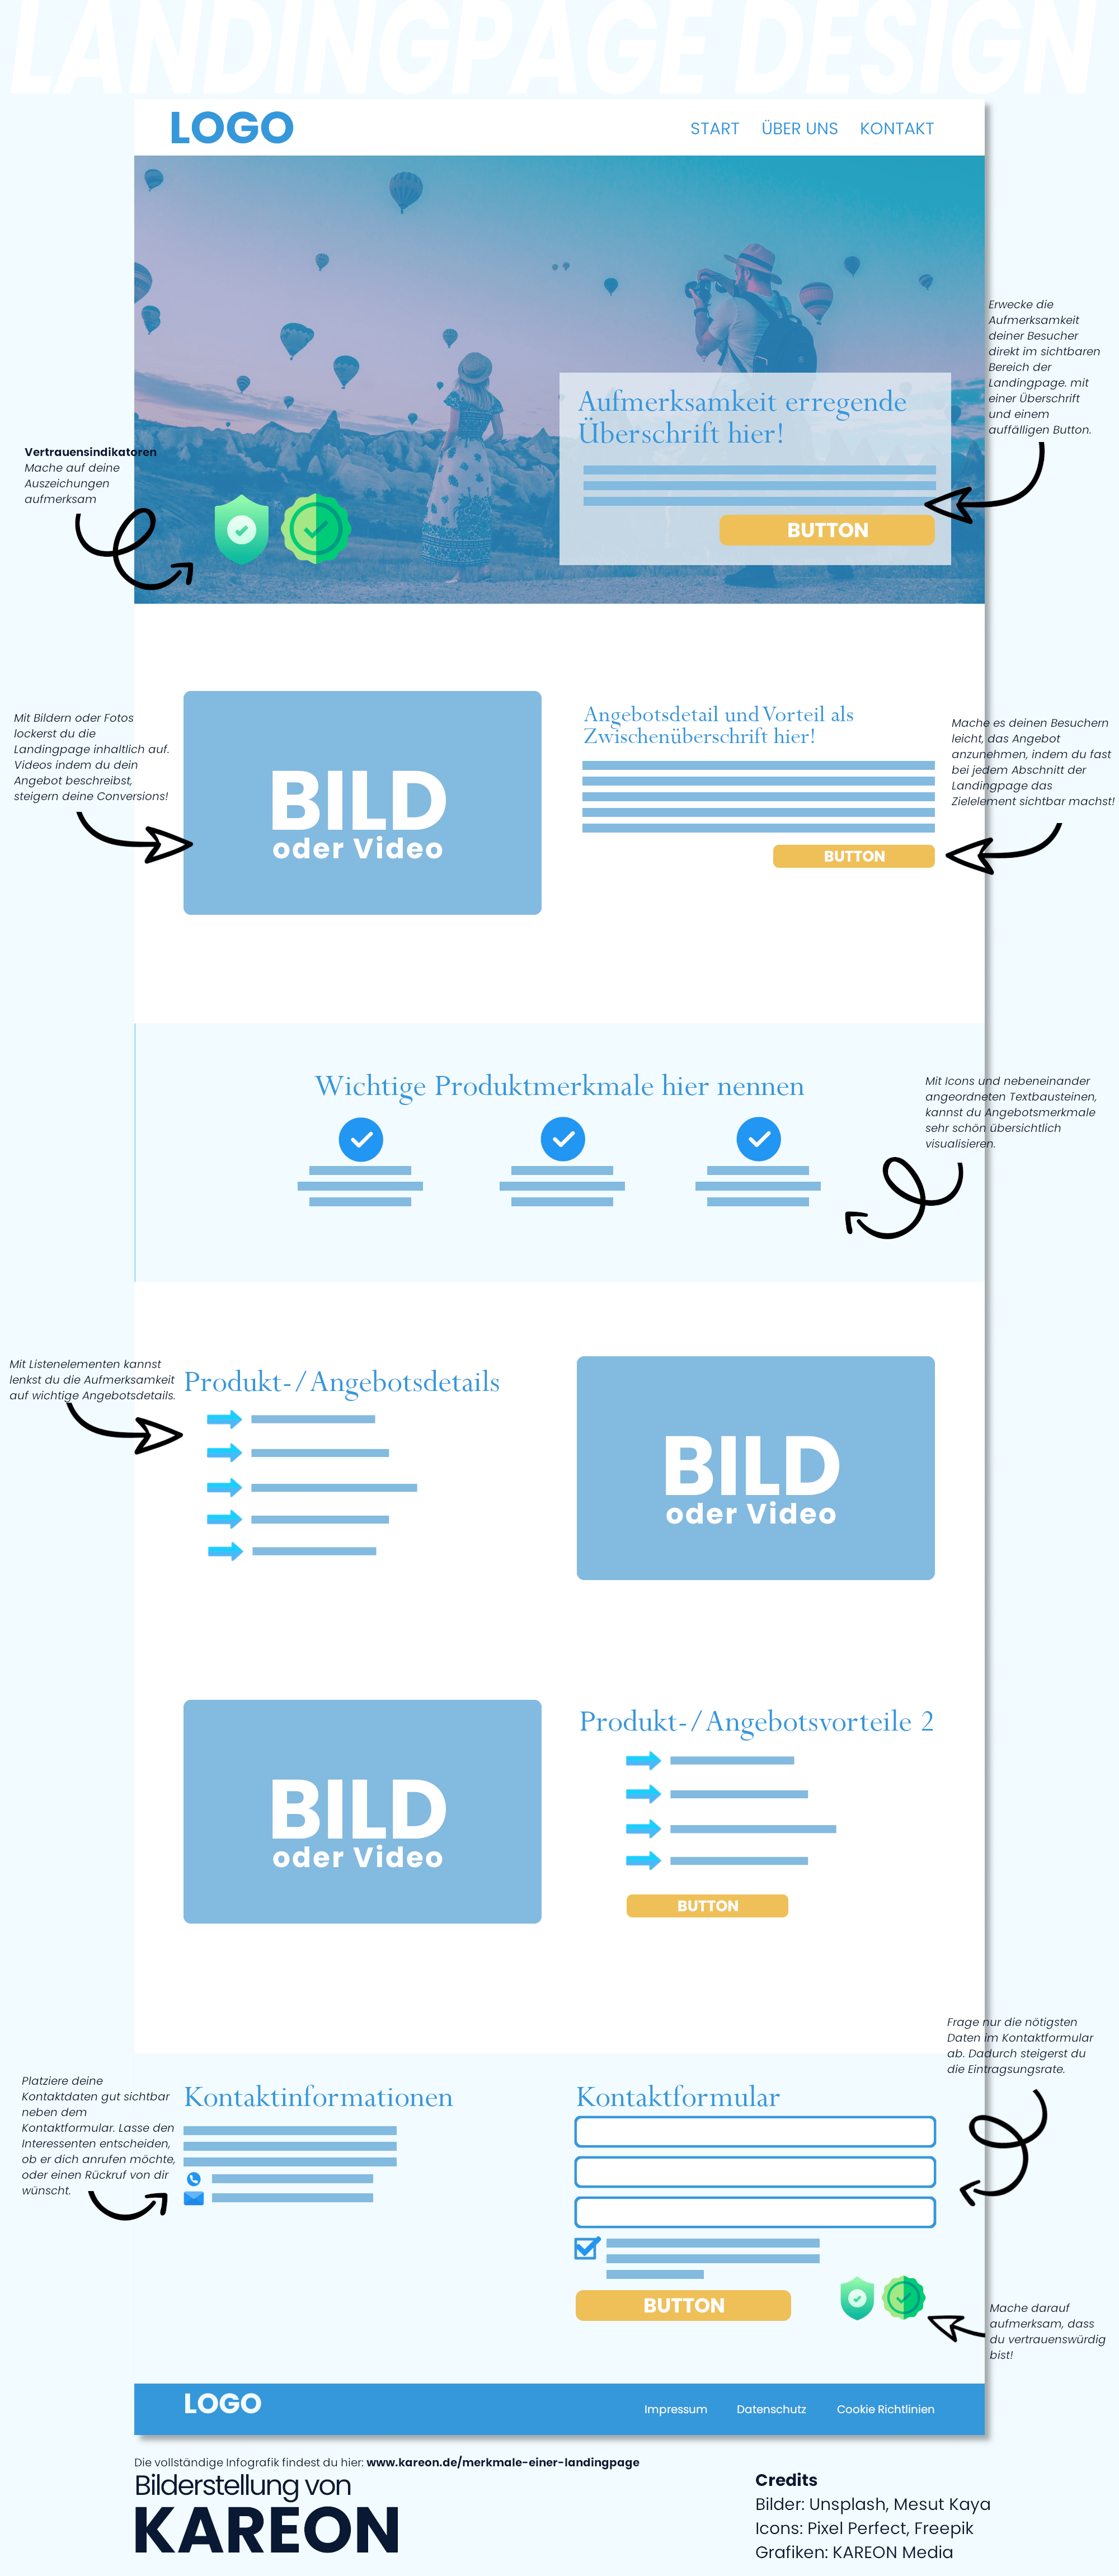 Merkmale einer Landingpage